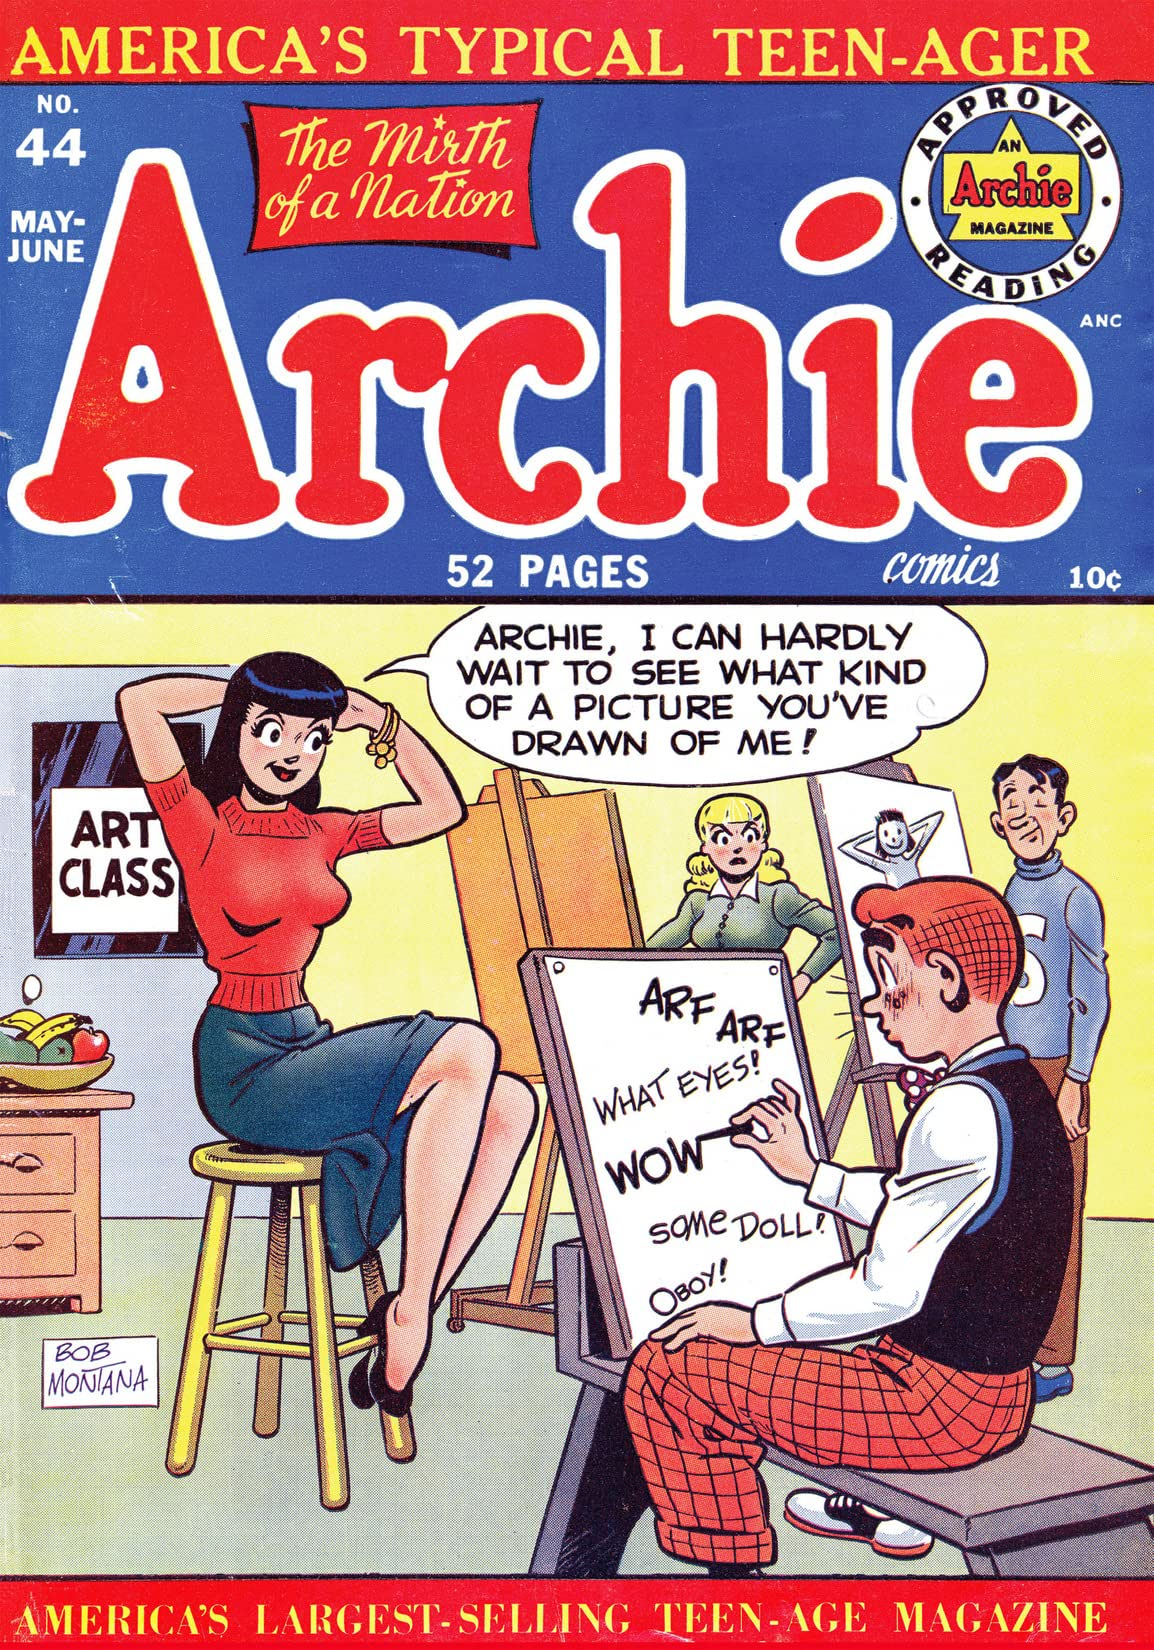 Archie #44